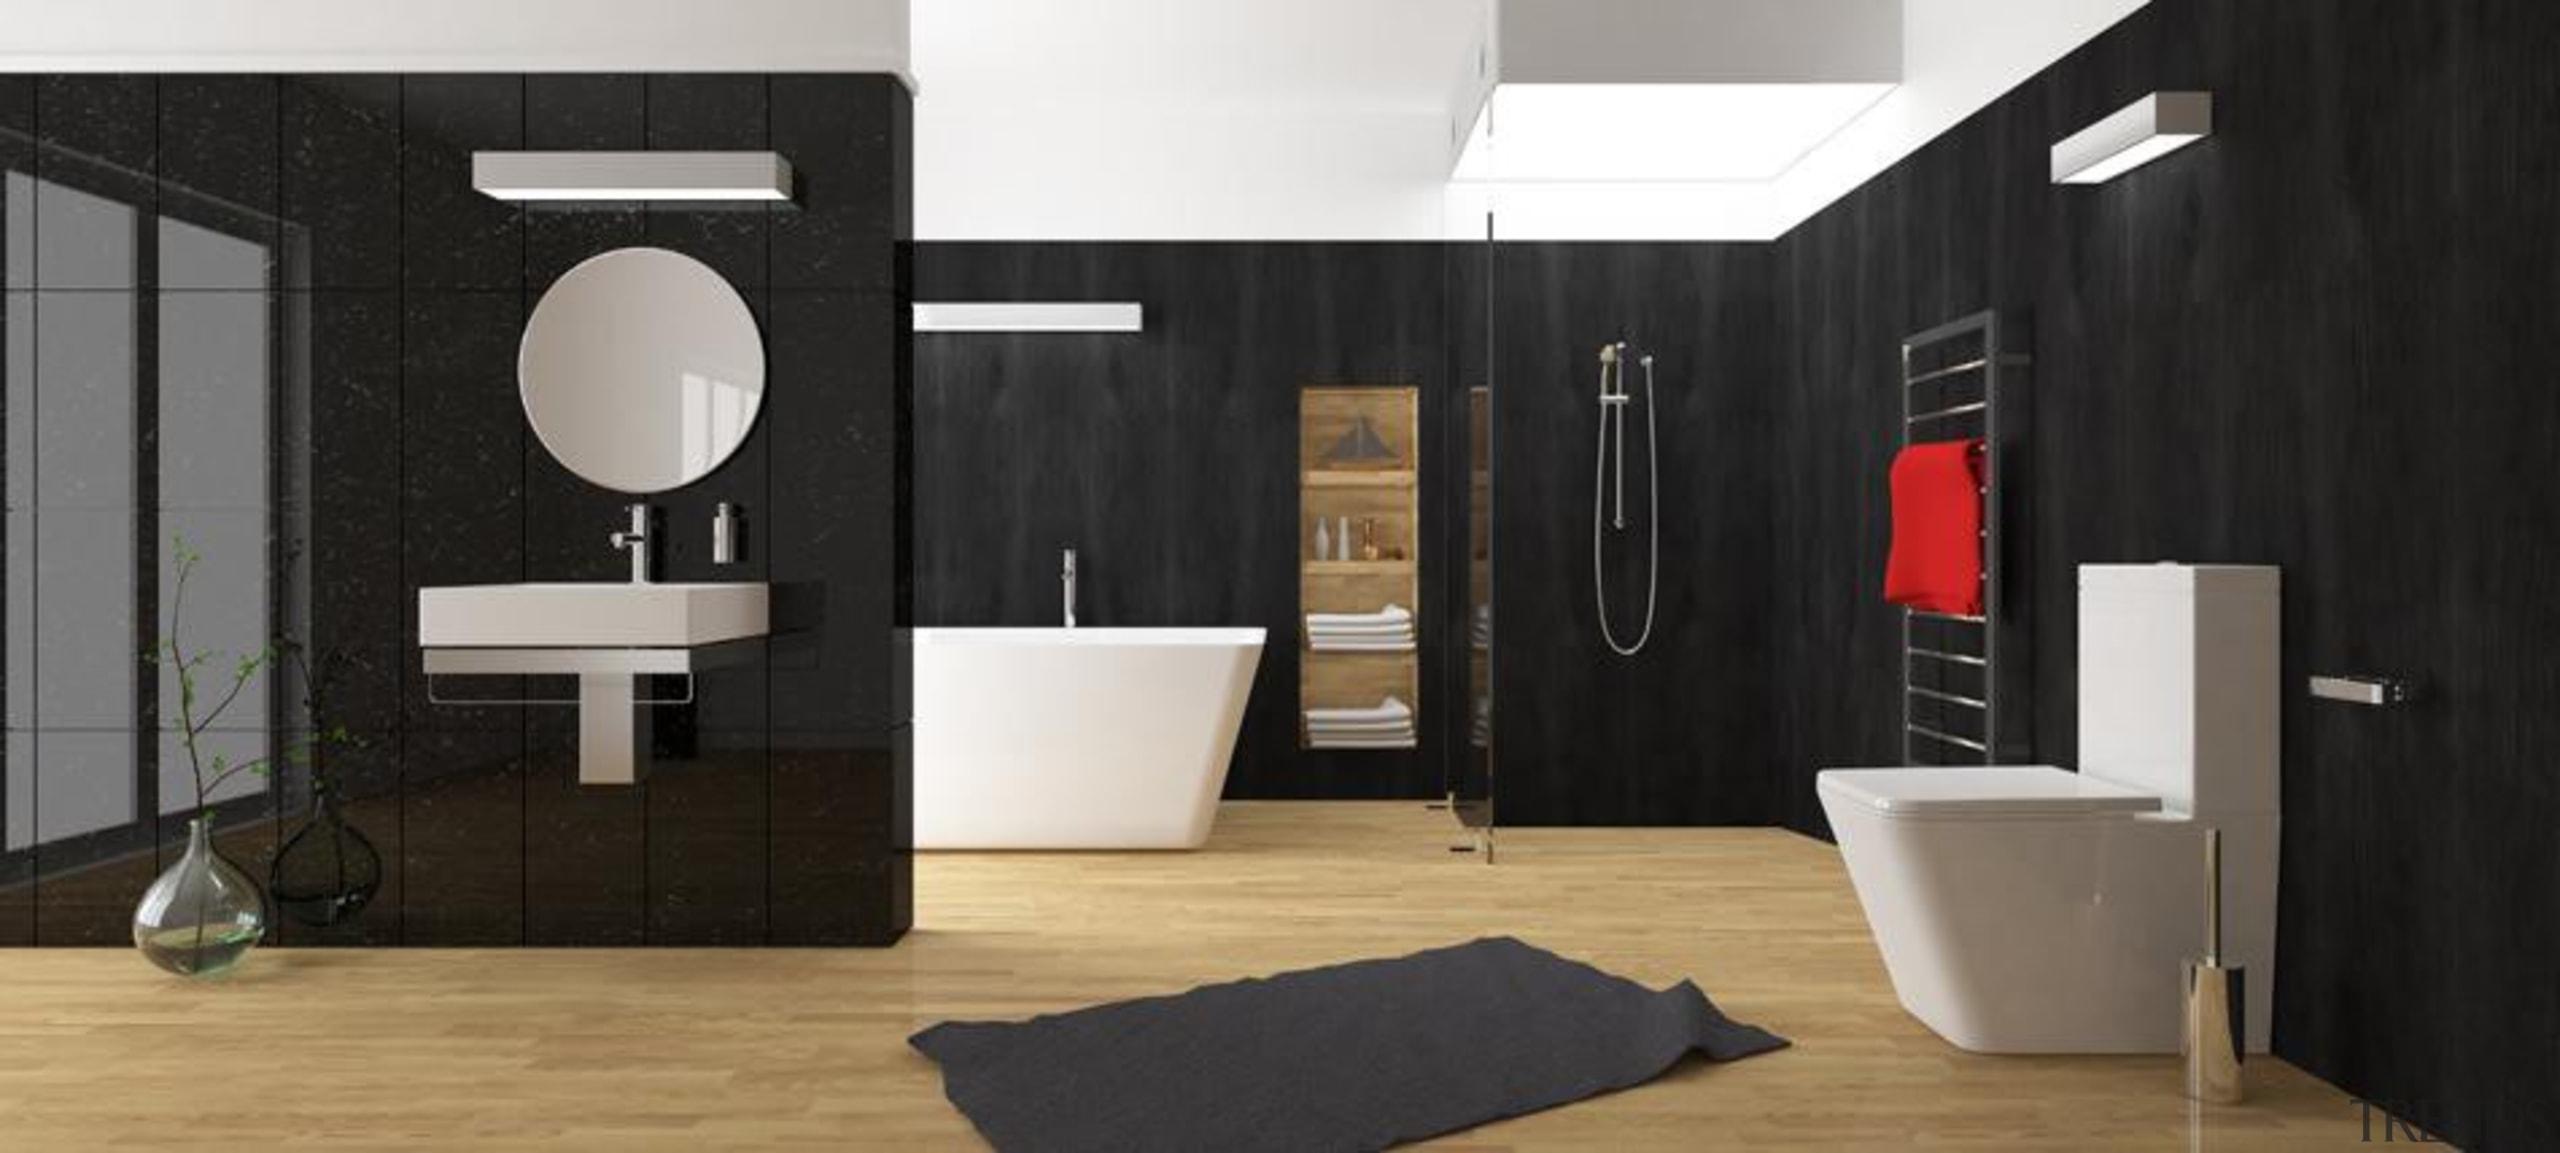 The elegantly rounded square profile of the Veloso bathroom, floor, flooring, interior design, plumbing fixture, room, black